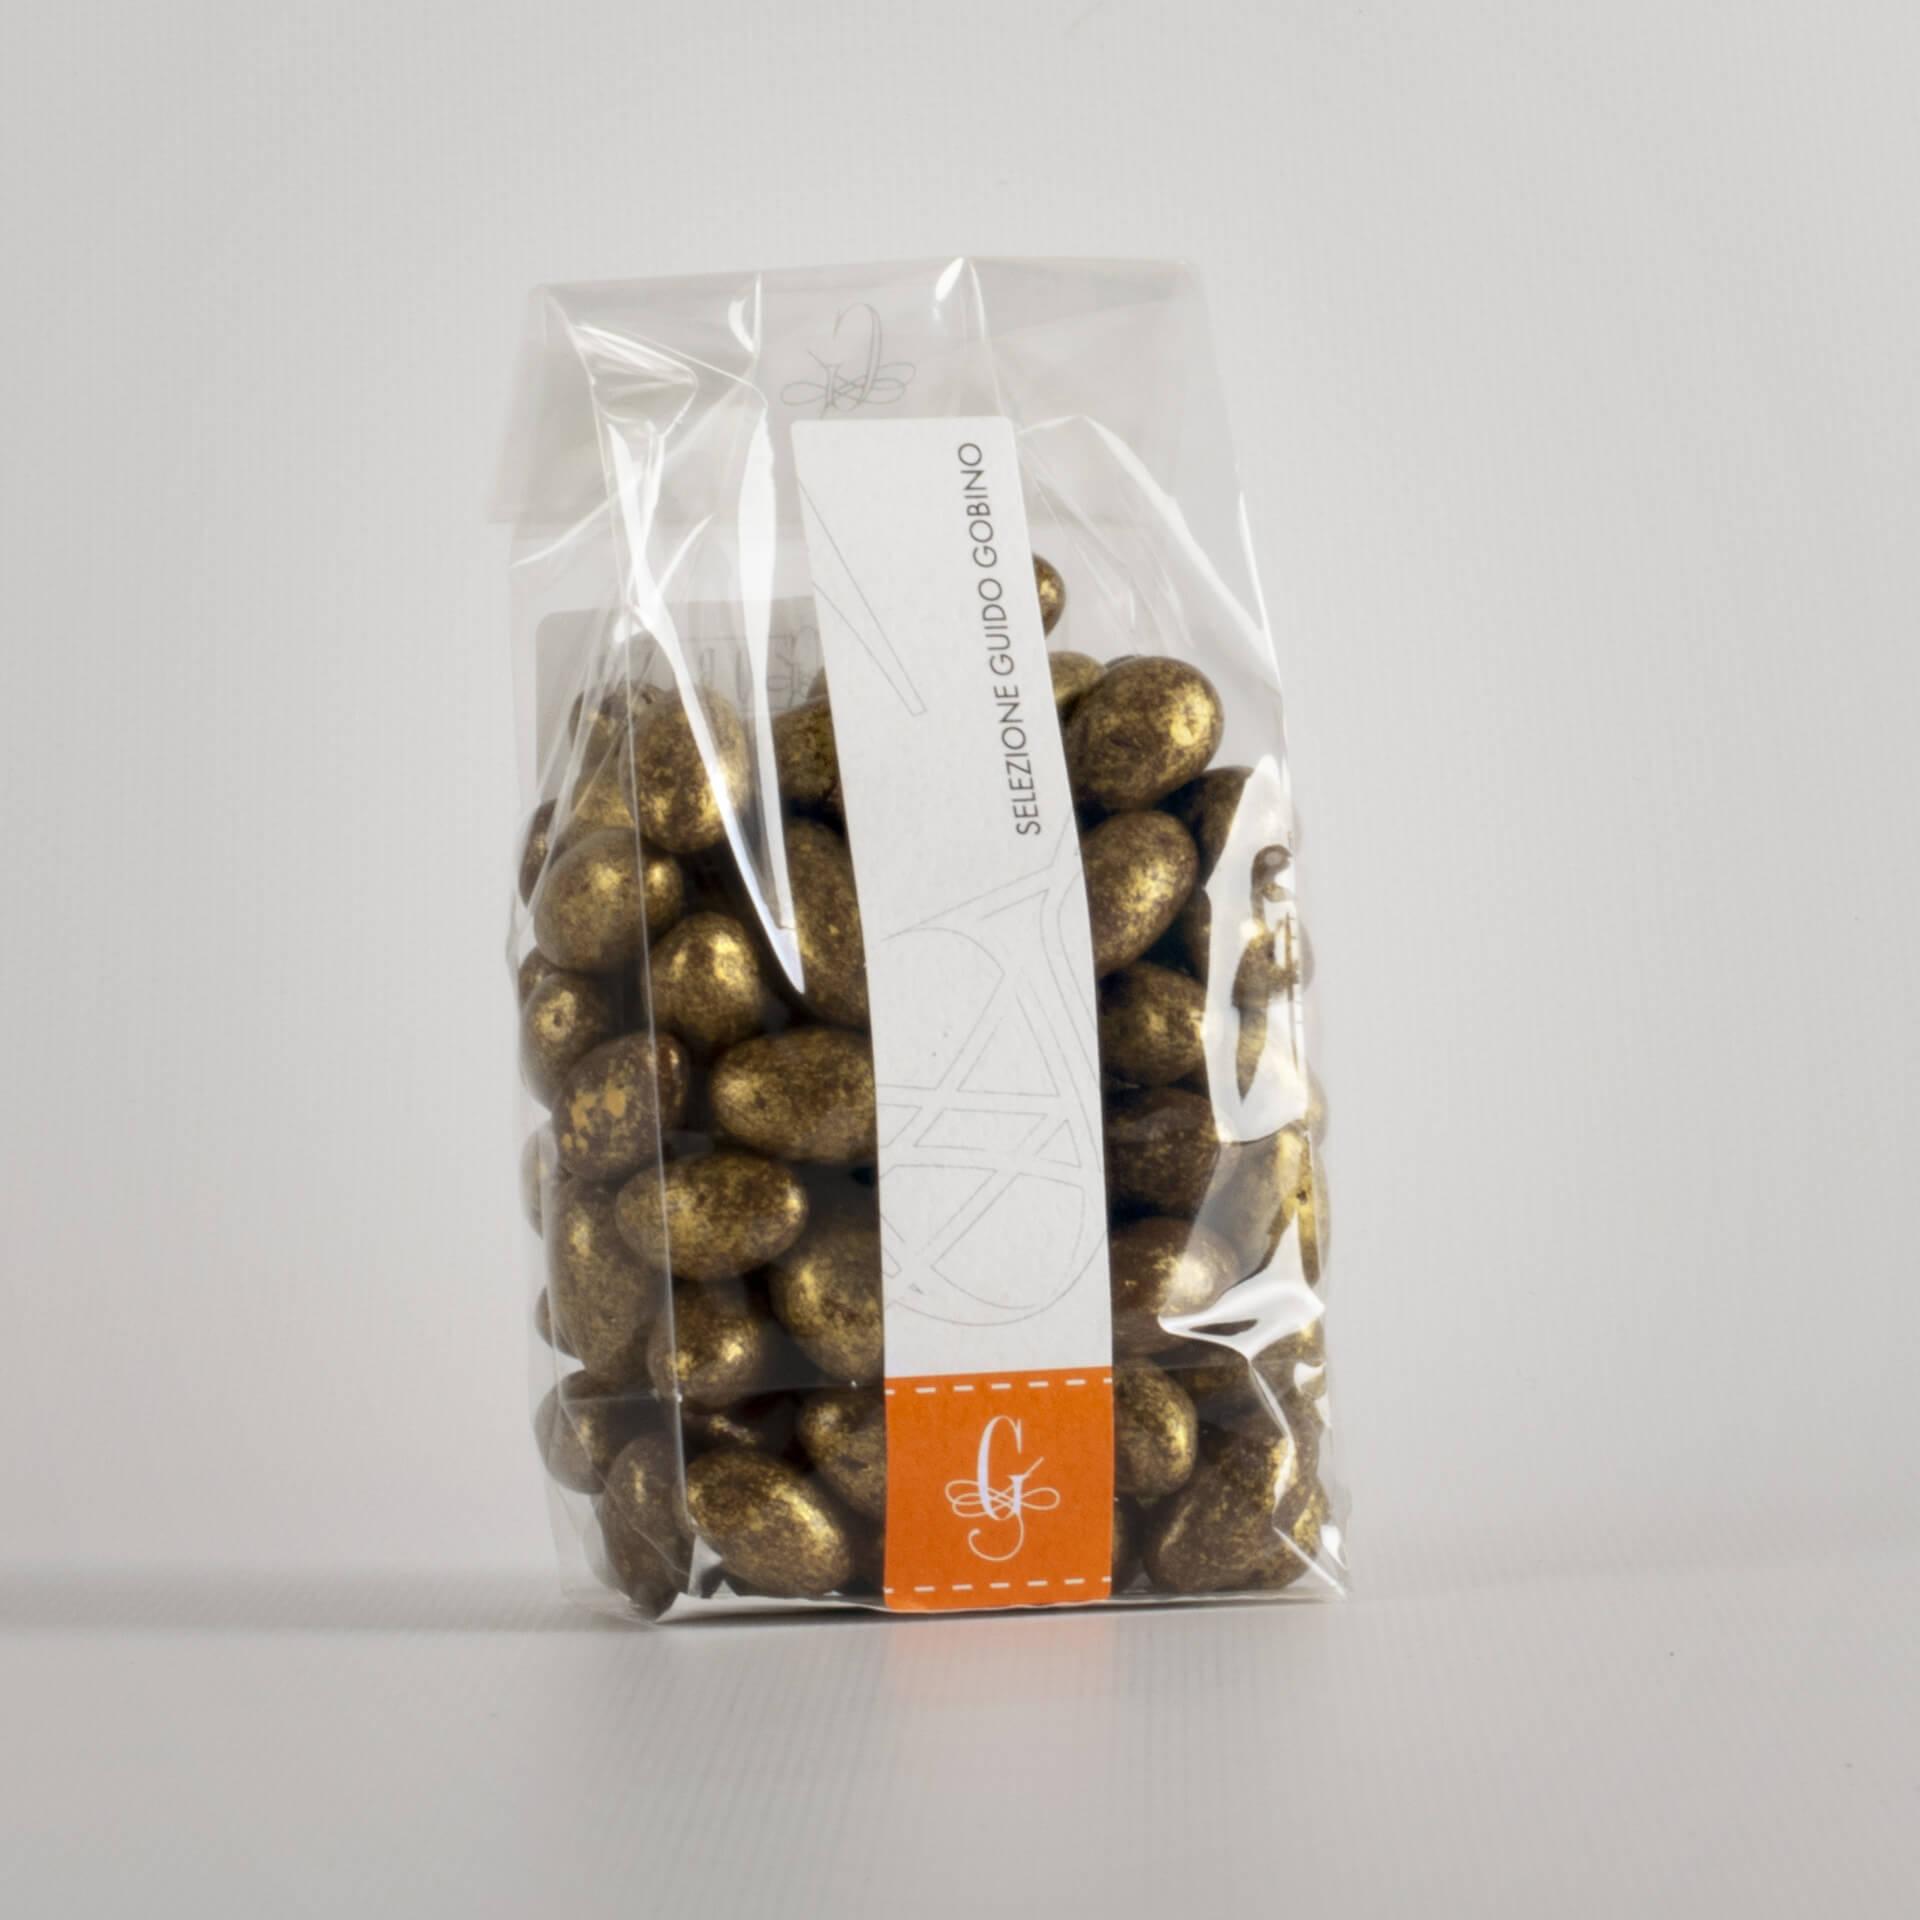 Dragees pistacchio dorato